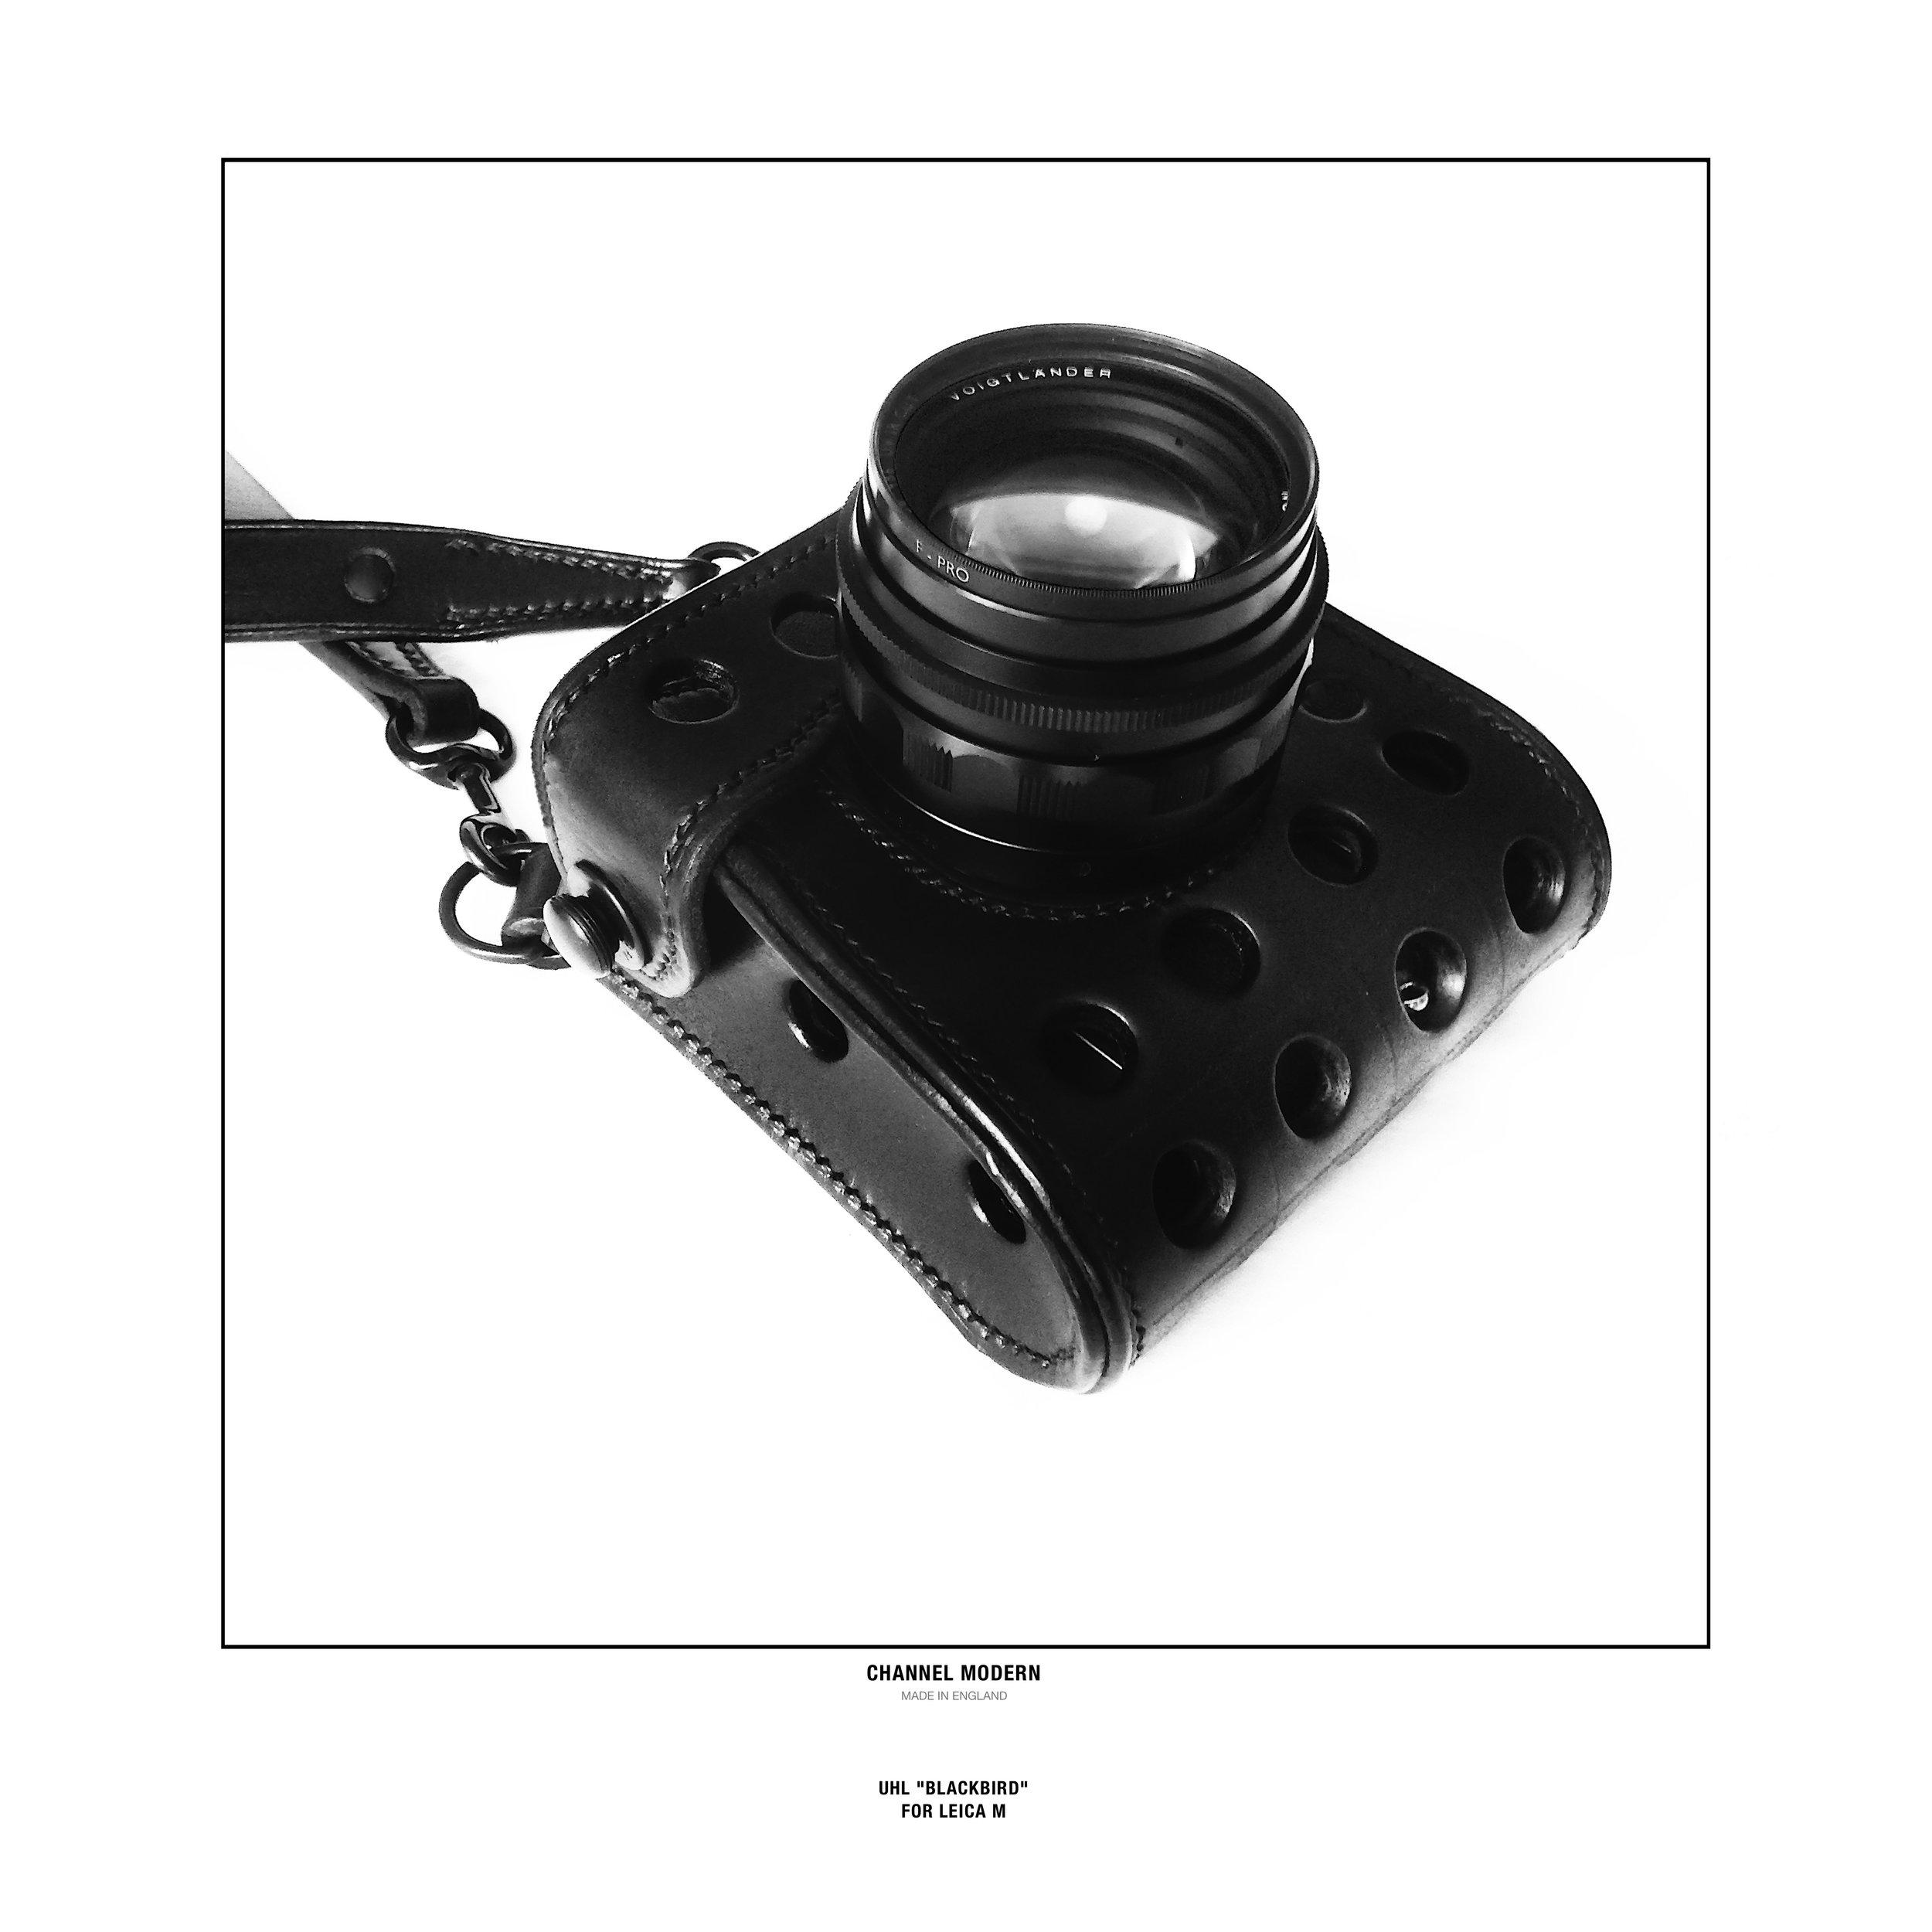 CM UHL BLACKBIRD LEICA CASE 1.jpg